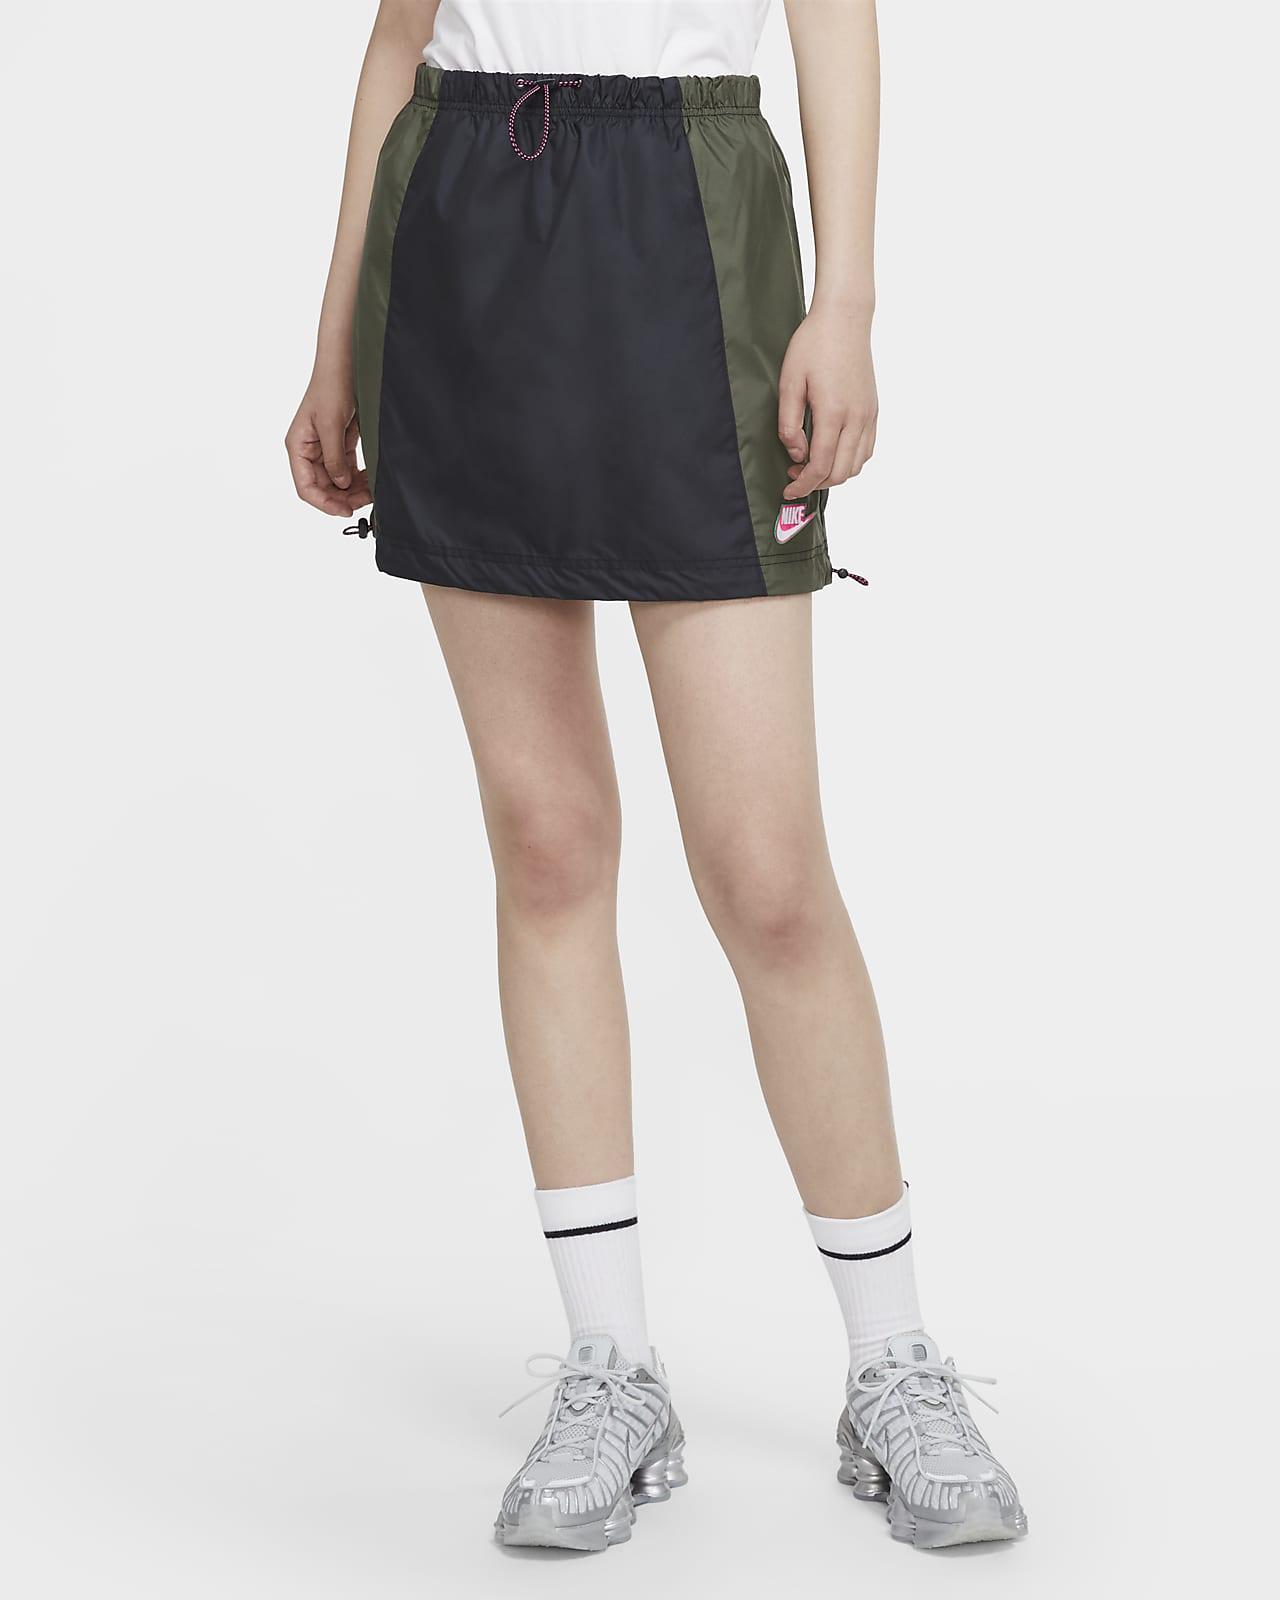 Falda de tejido Woven para mujer Nike Sportswear Icon Clash